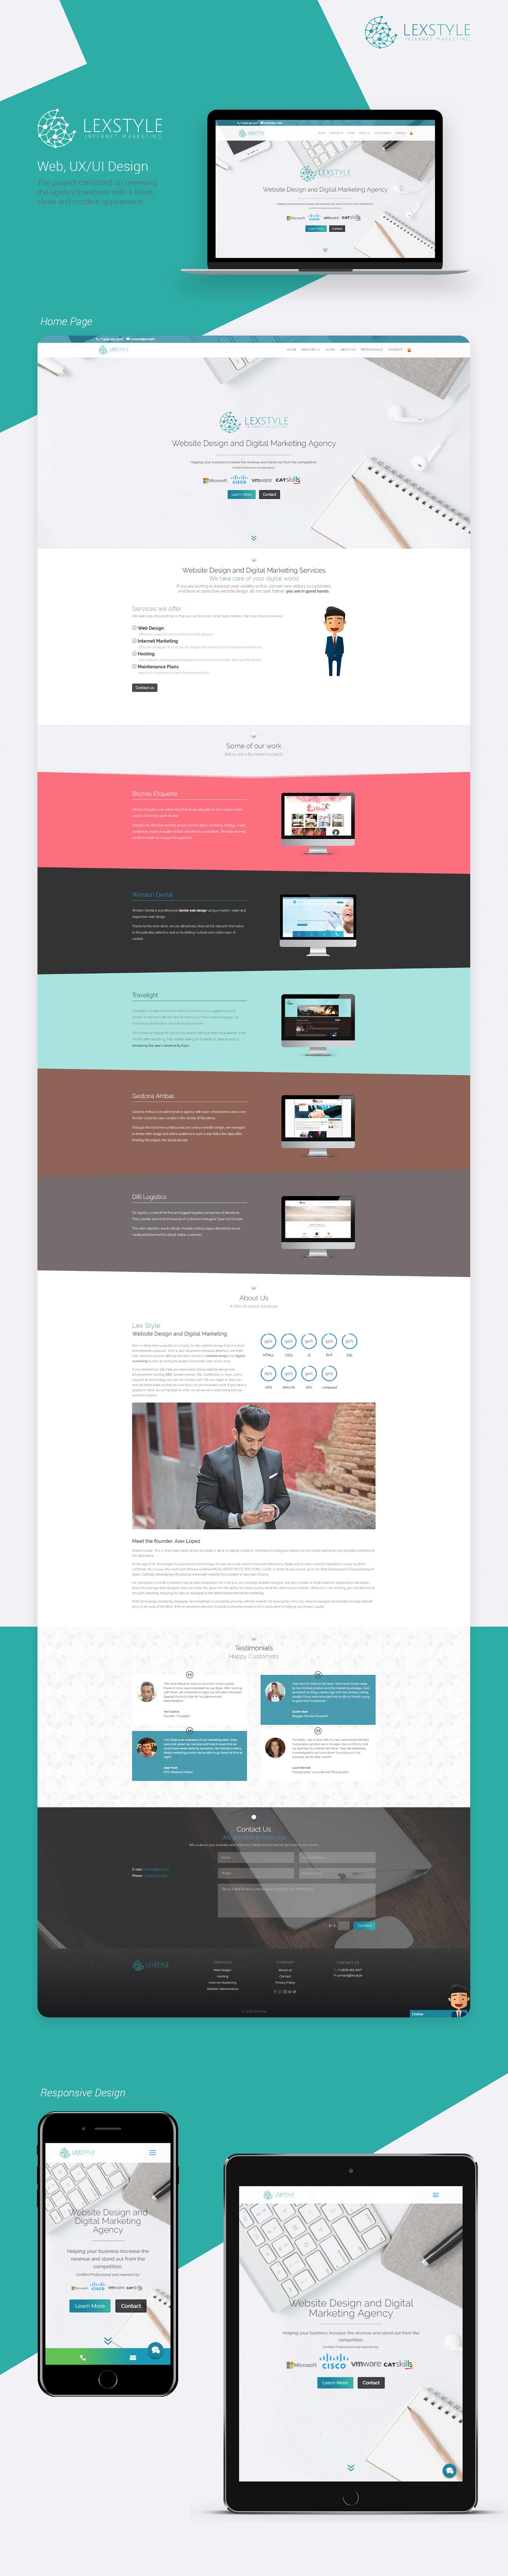 Web Design  Website Design uxdesign uidesign lexstyle Clean Design Modern Design